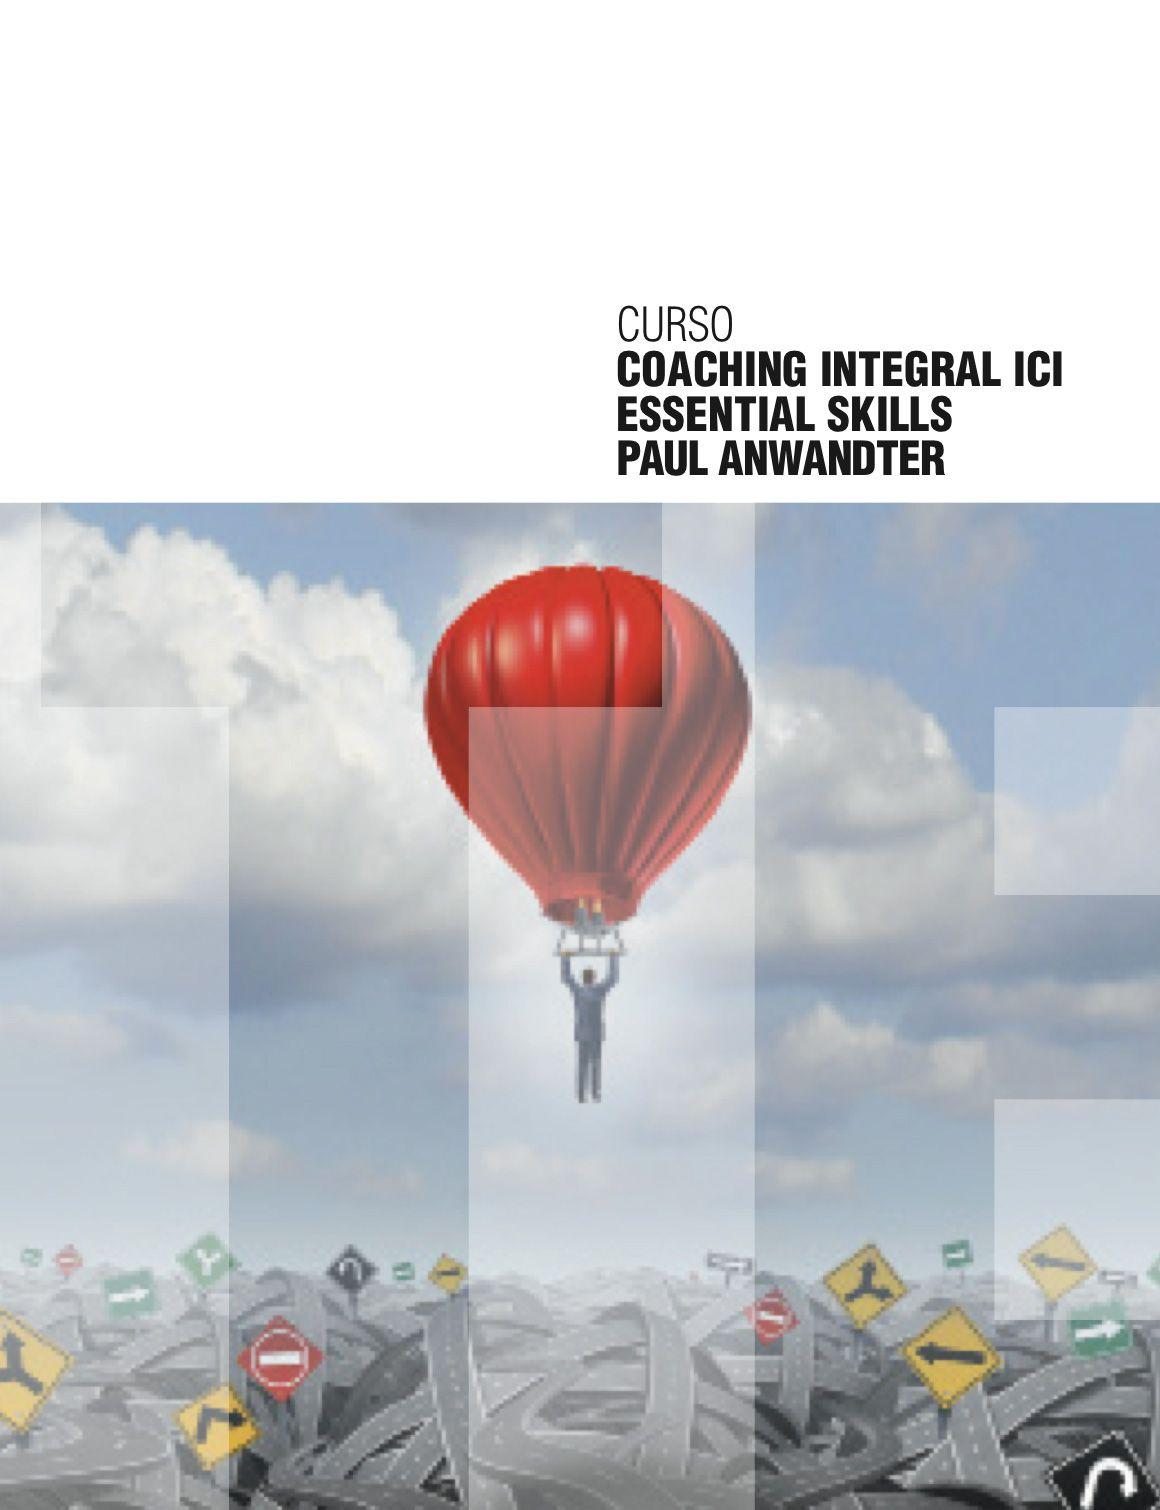 CURSO COACHING INTEGRAL ICI ESSENTIAL SKILLS